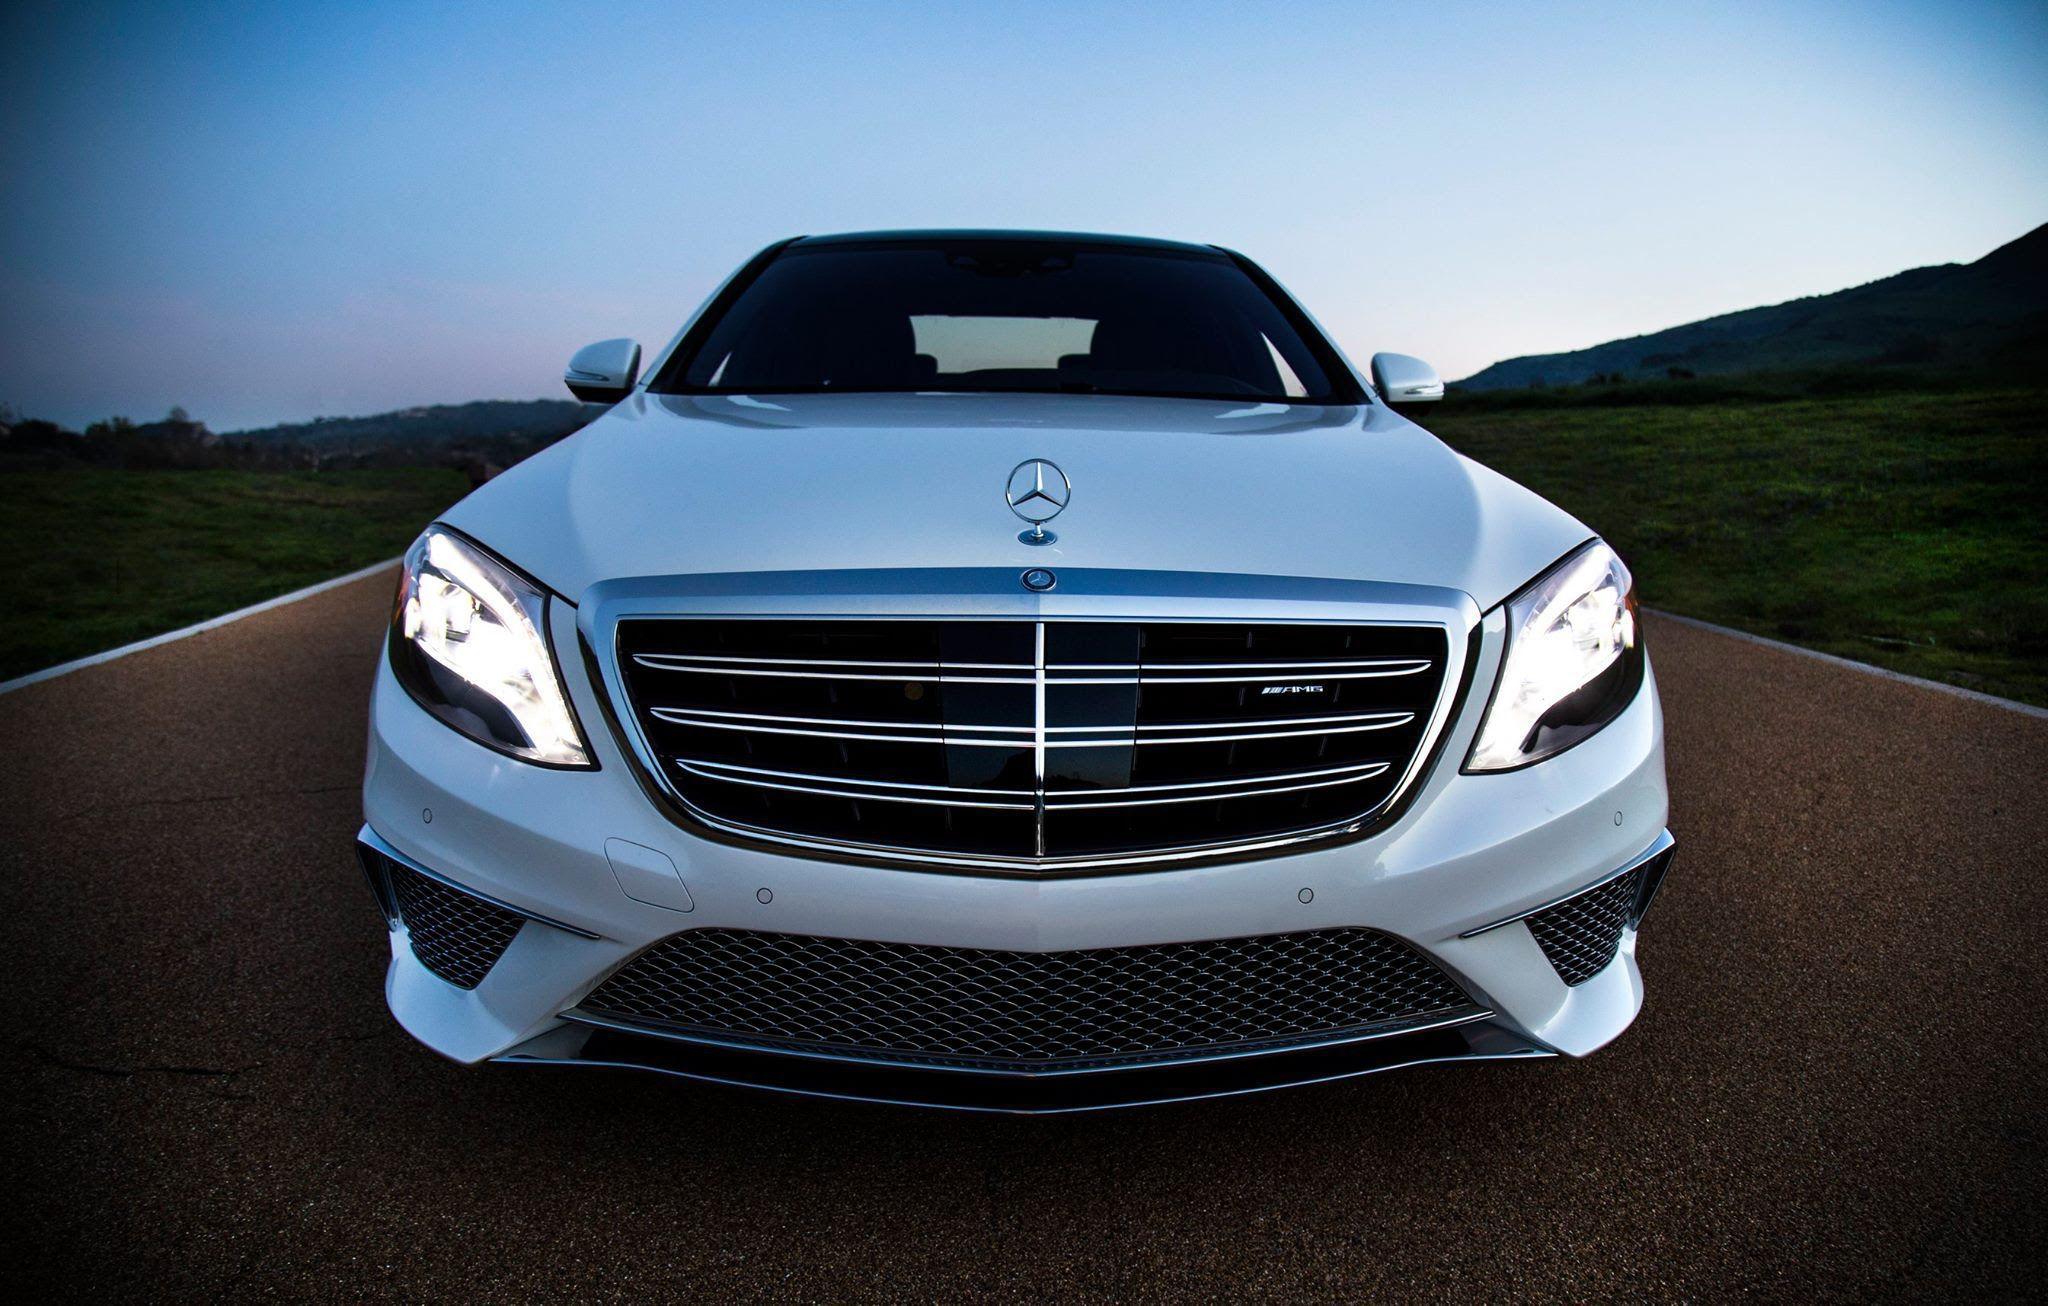 Mercedes Benz S65 Amg Hd